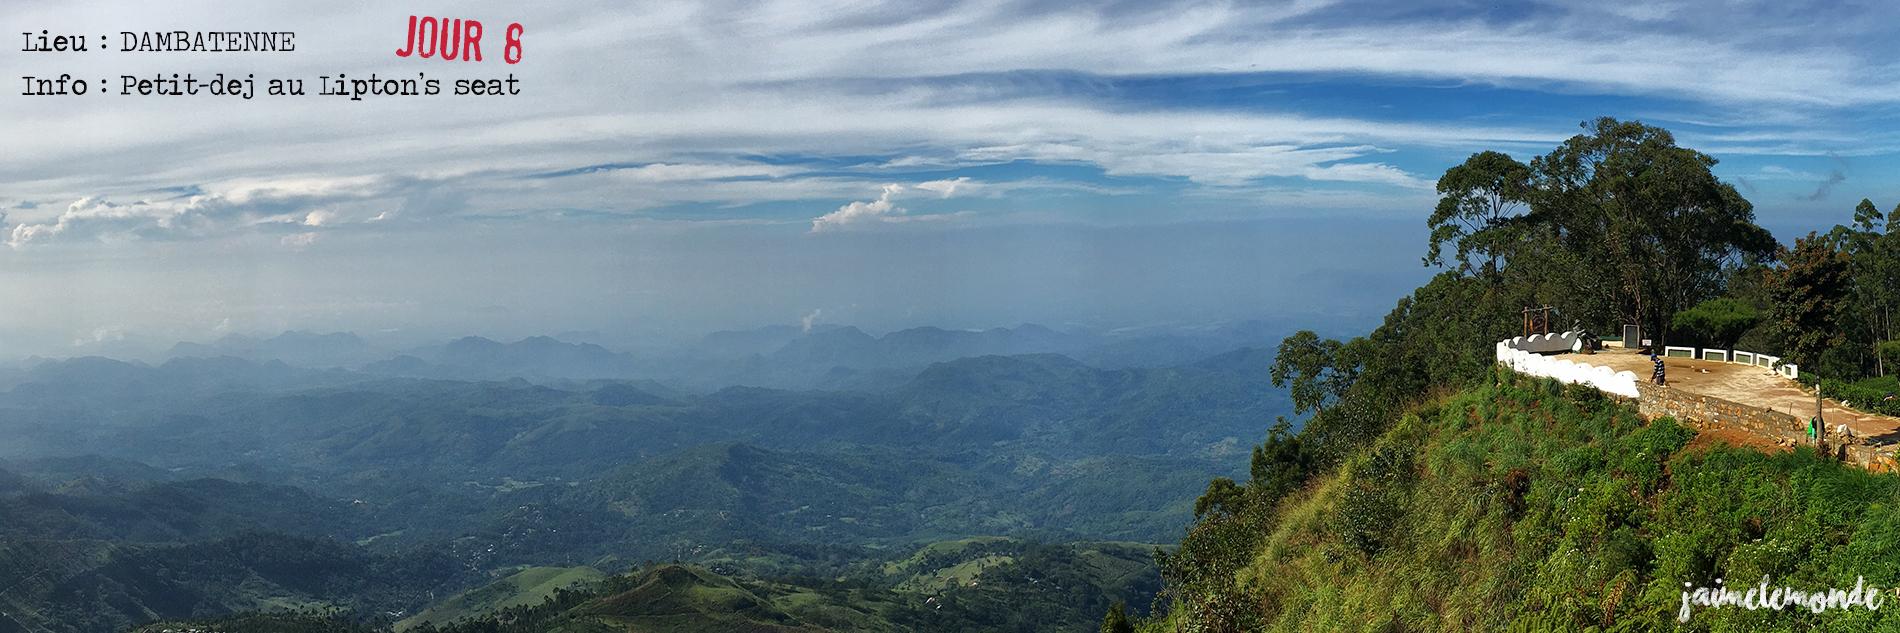 Voyage Sri Lanka - Itinéraire Jour 8 - 1 Dambatenne - Petit-dej au Lipton's seat - ©jaimelemonde